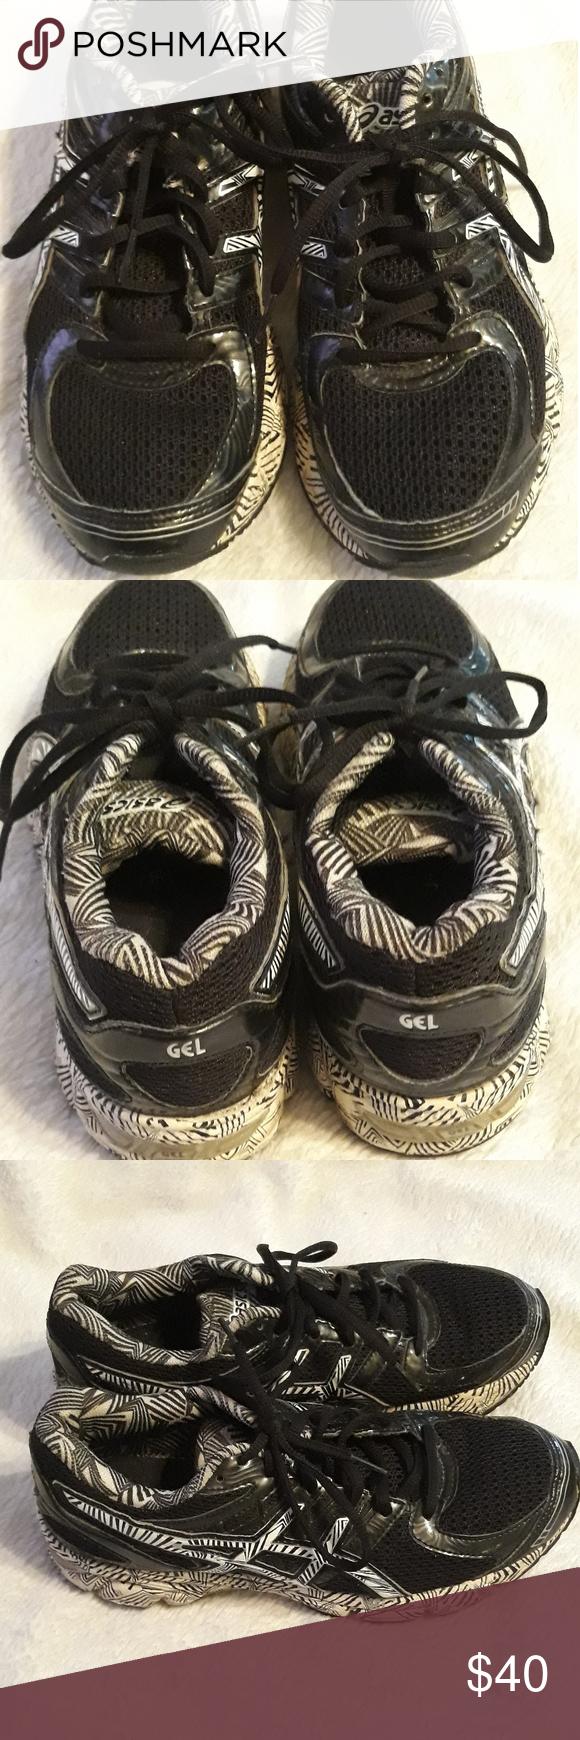 Womens Asics Gel Running Shoes T48AQ